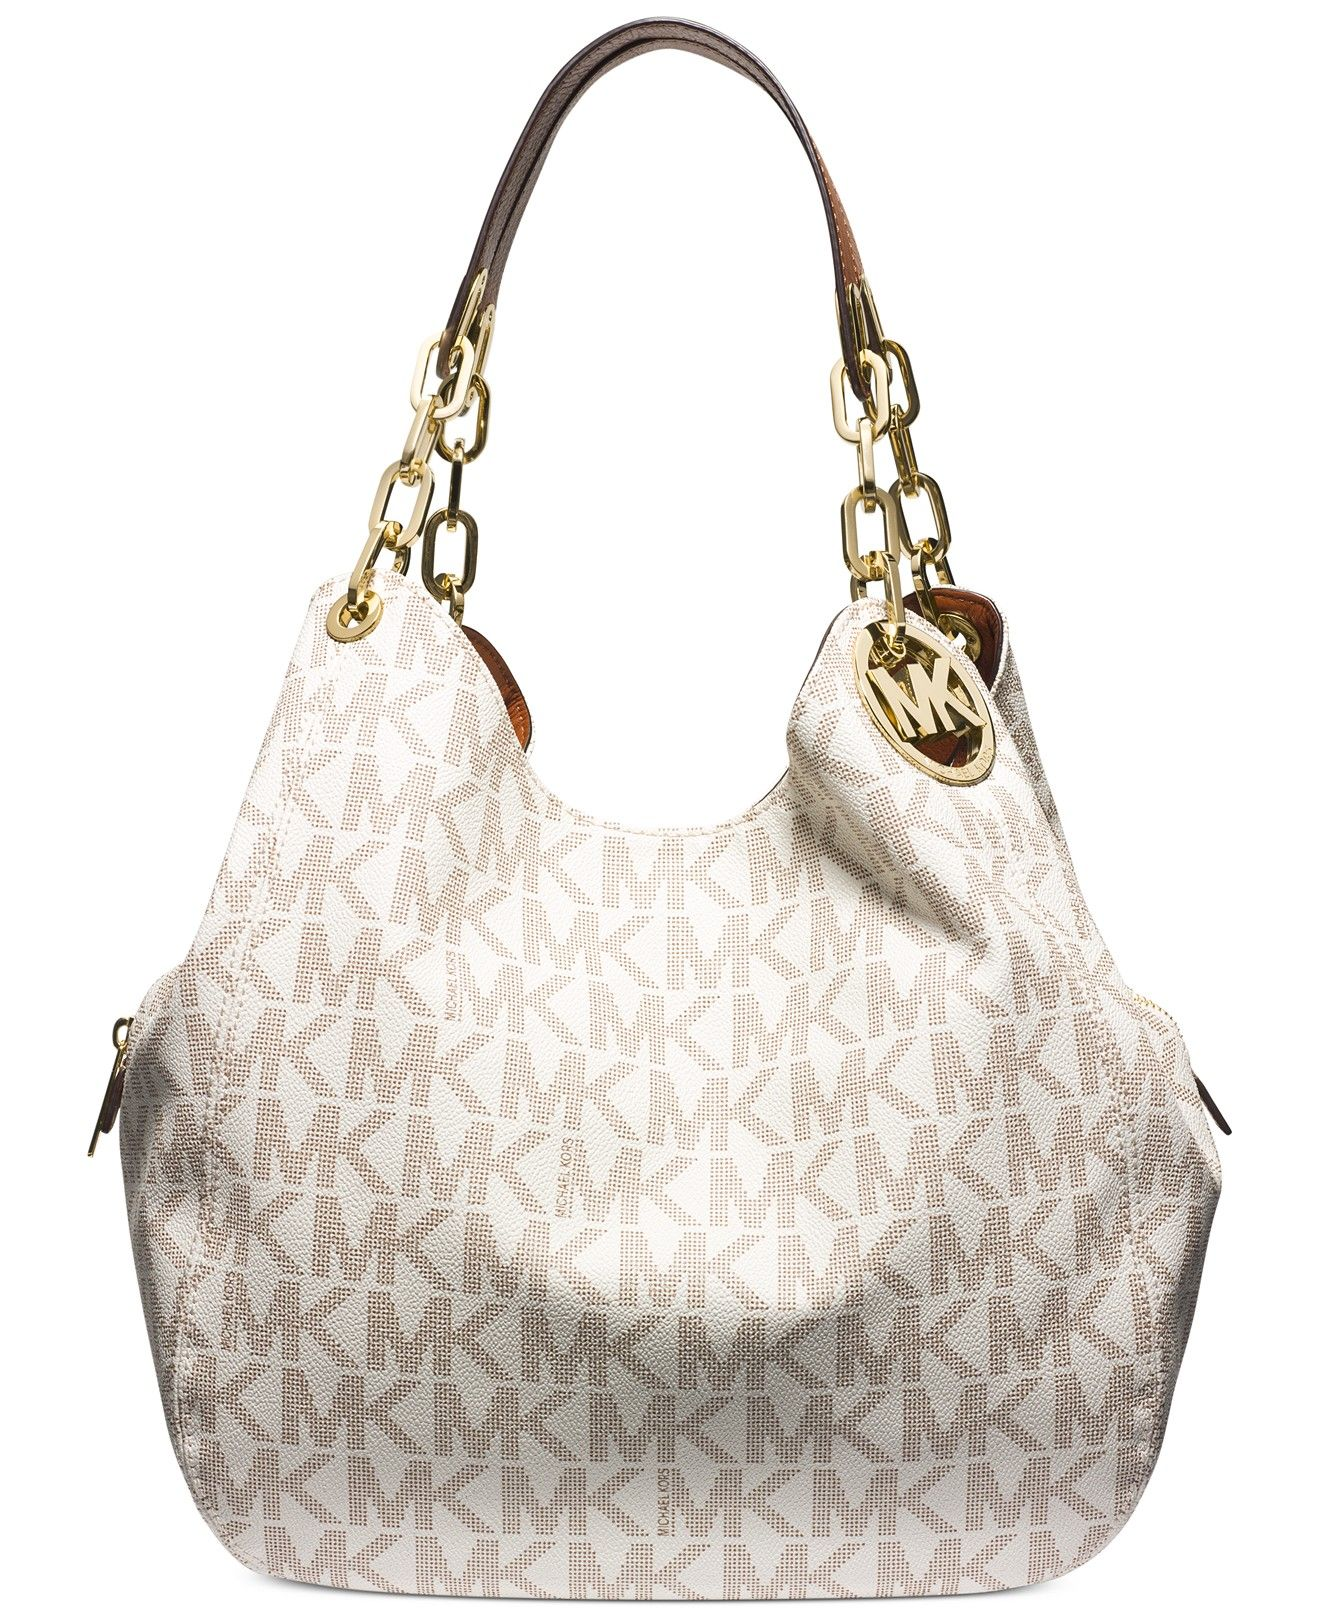 c5a0160f7048 MICHAEL Michael Kors Fulton Large Shoulder Tote - Handbags Accessories -  Macys